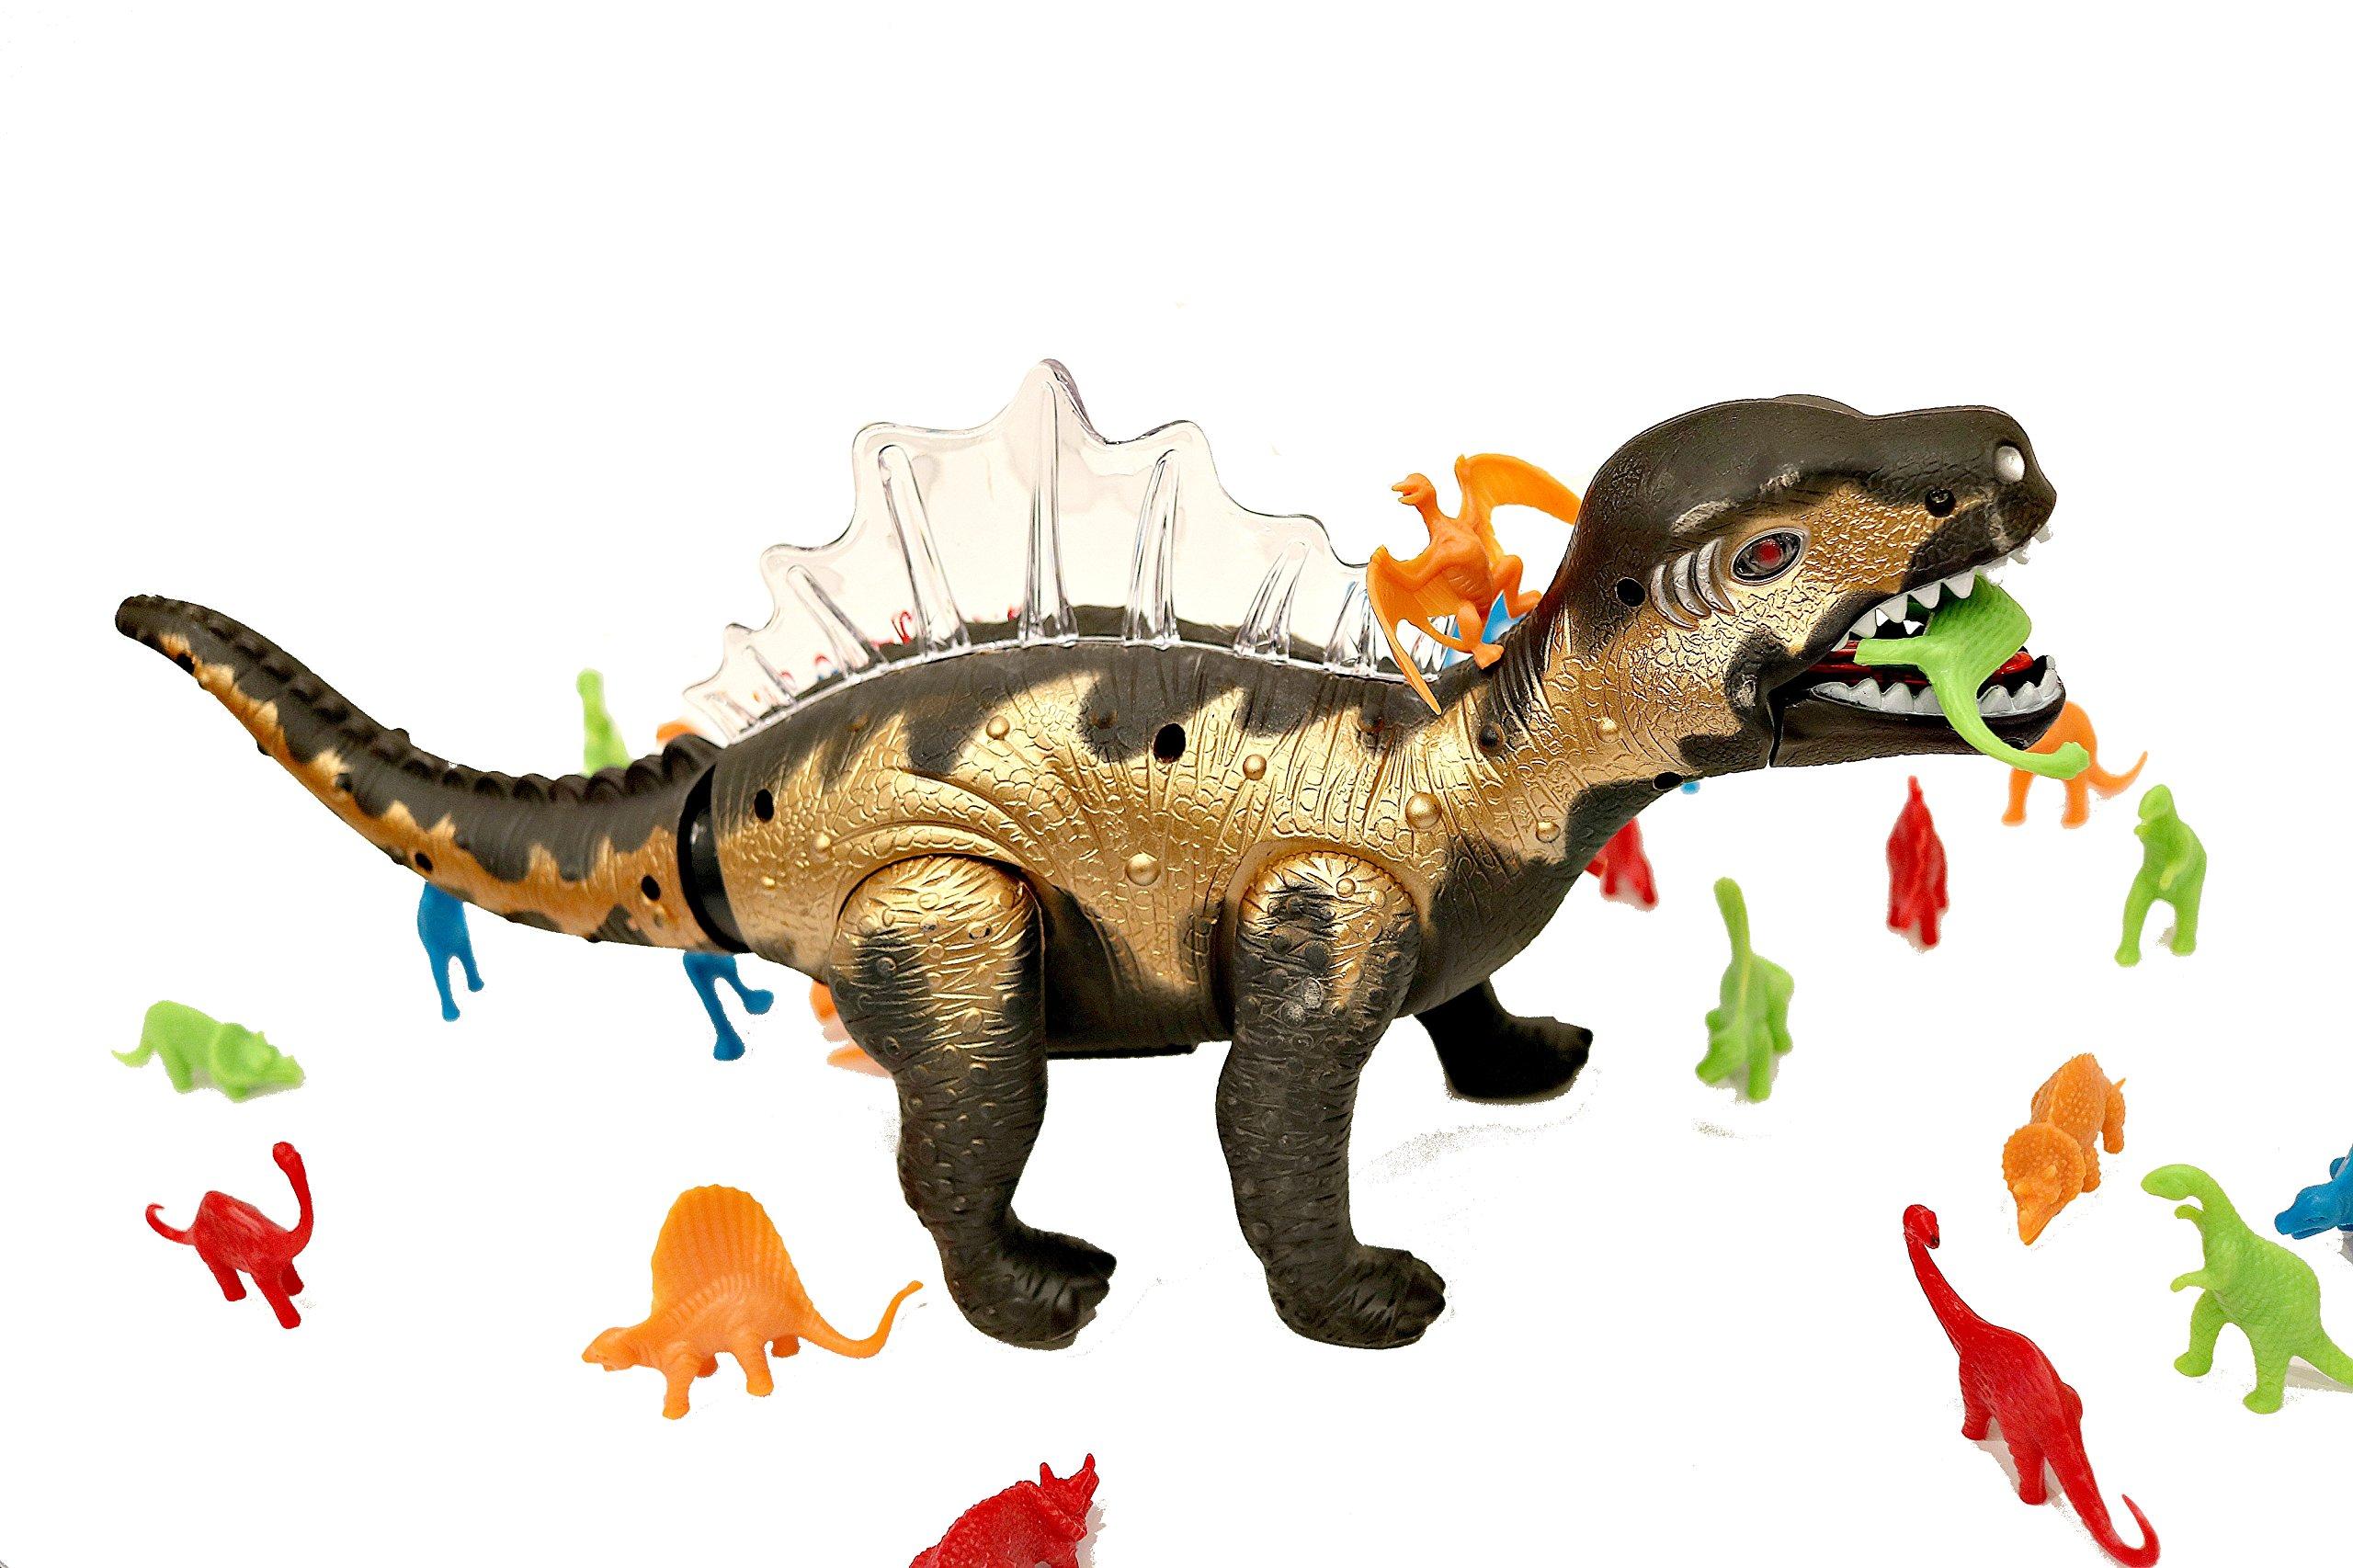 Spinosaurus Best Dinosaur Toy Figures Bundle for Kids!! 33 Pcs. Dinosaur Set. - Predator Vs. Prey Life-Like and Educational Dinosaurs. for Boys and Girls. LED- Lights UP, Walks and Roars!!!!